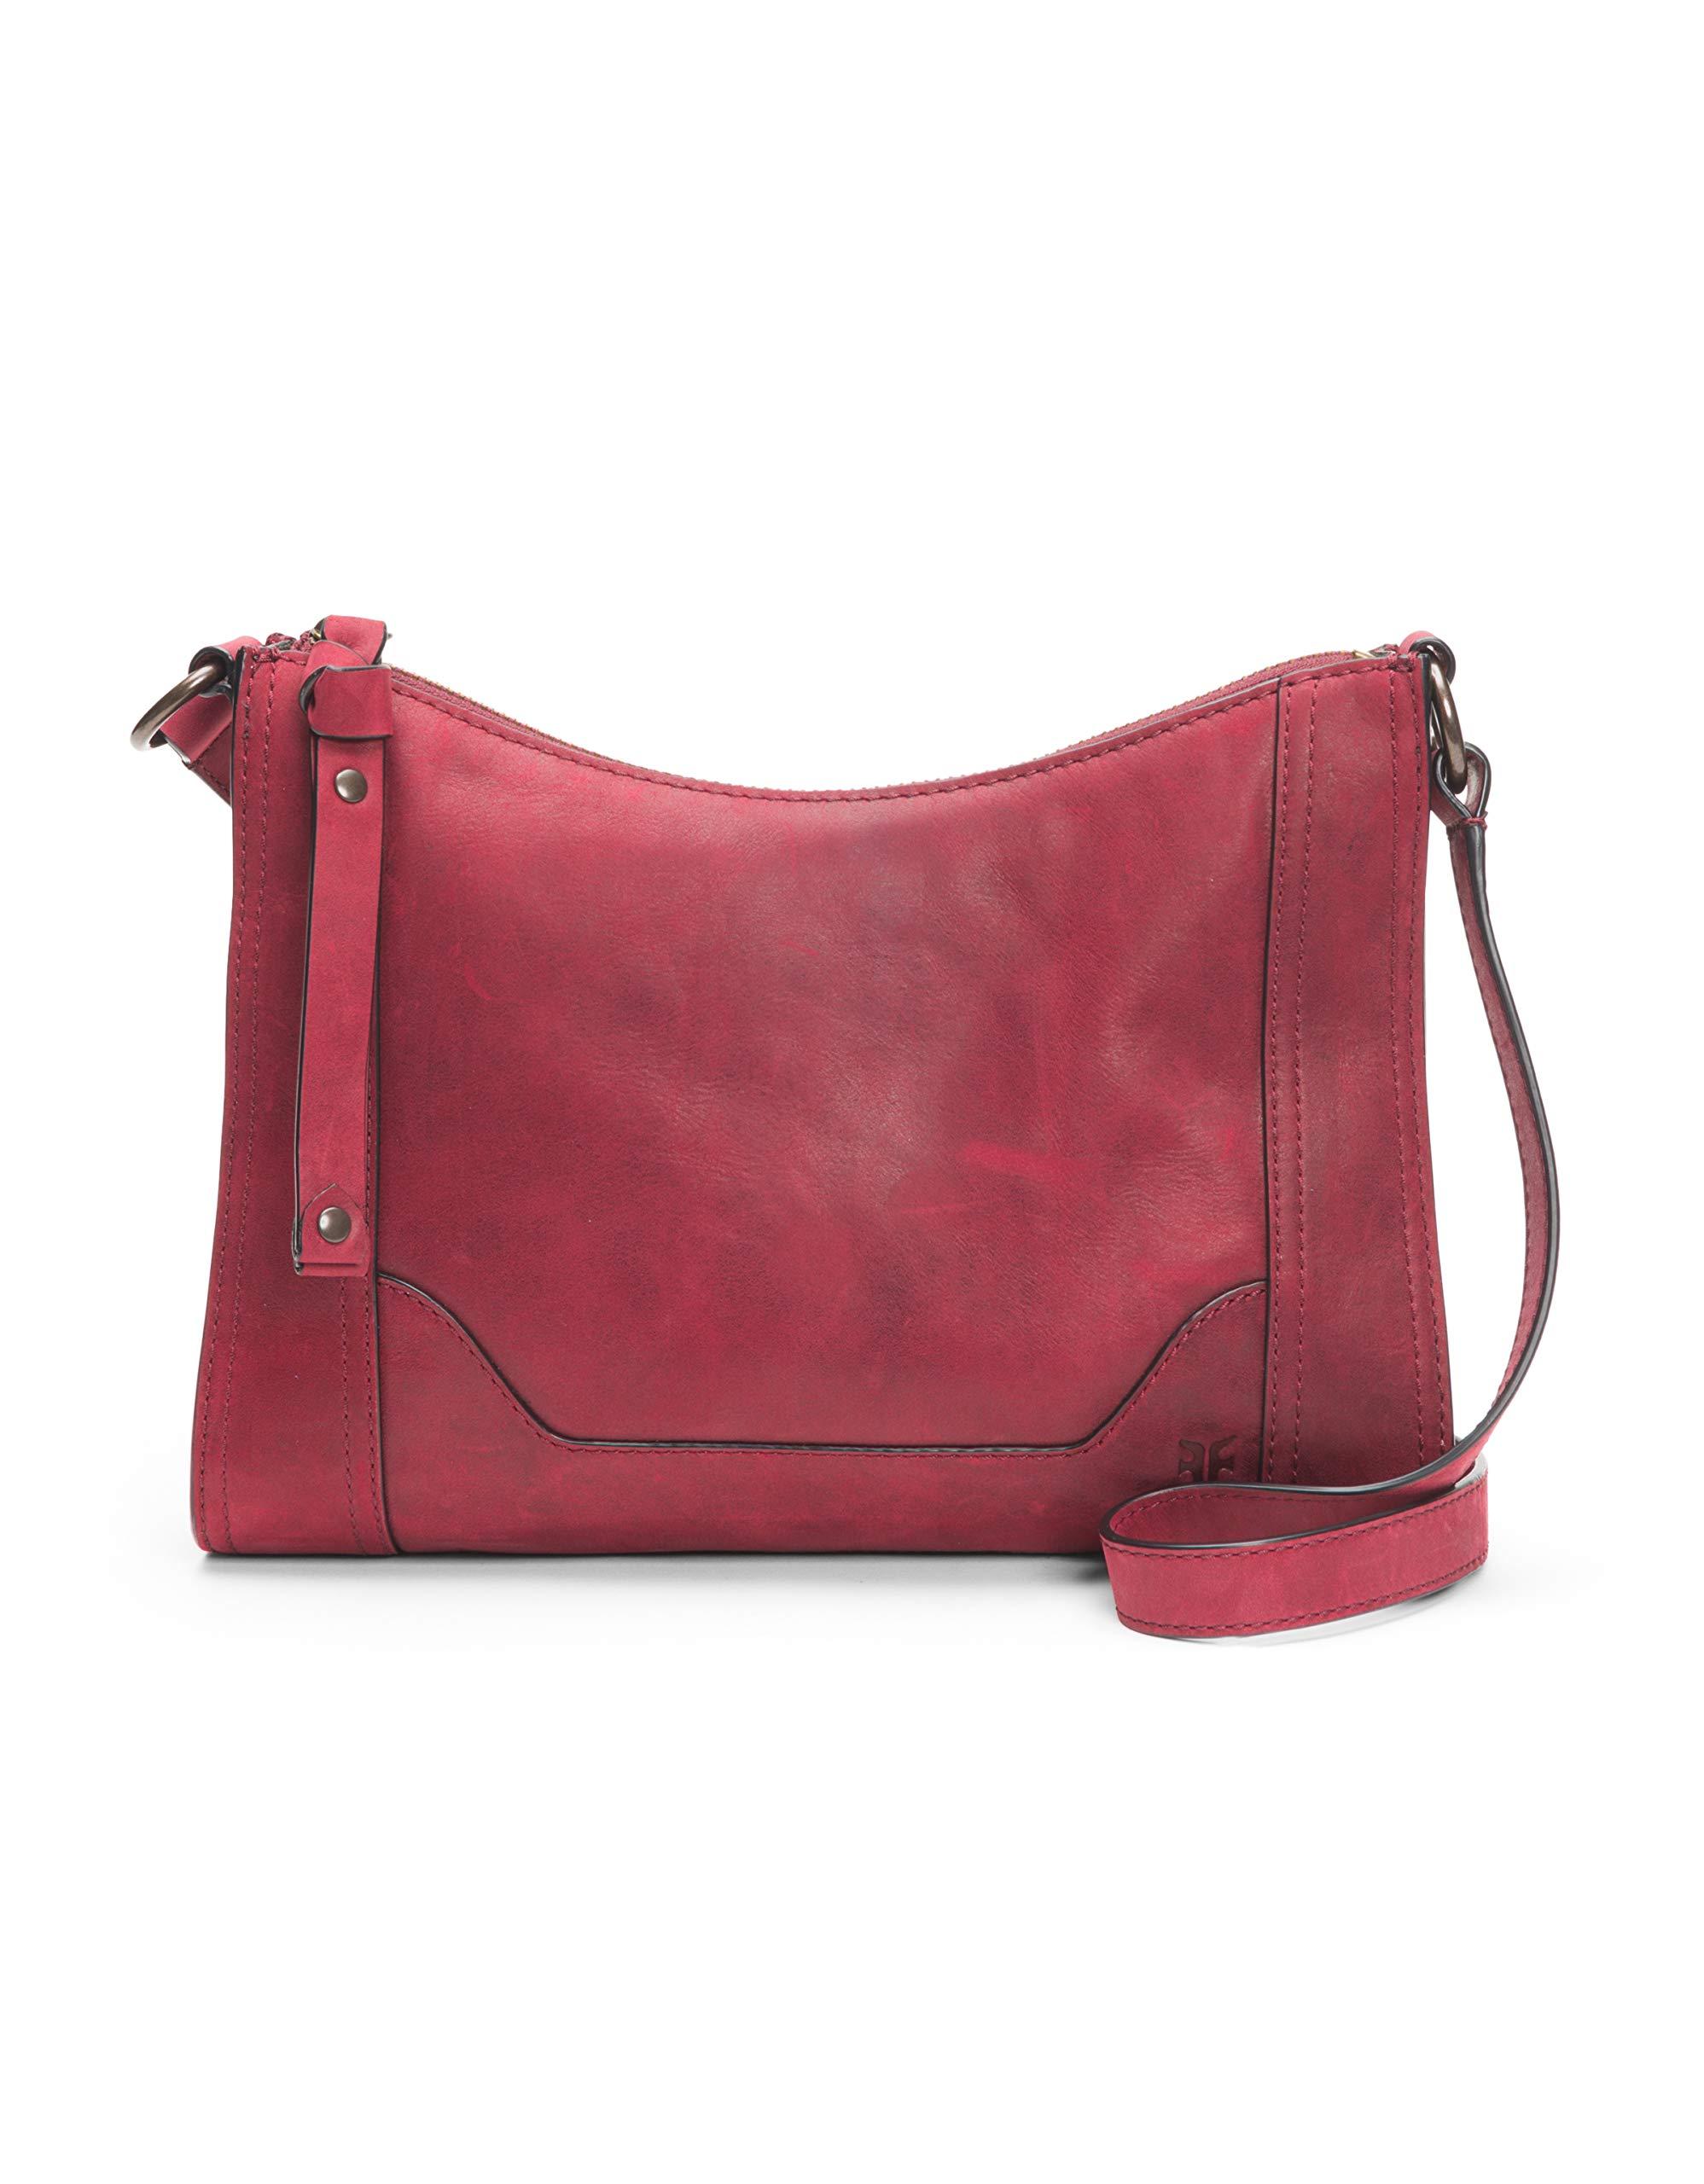 FRYE Melissa Zip Leather Crossbody Bag, sangria